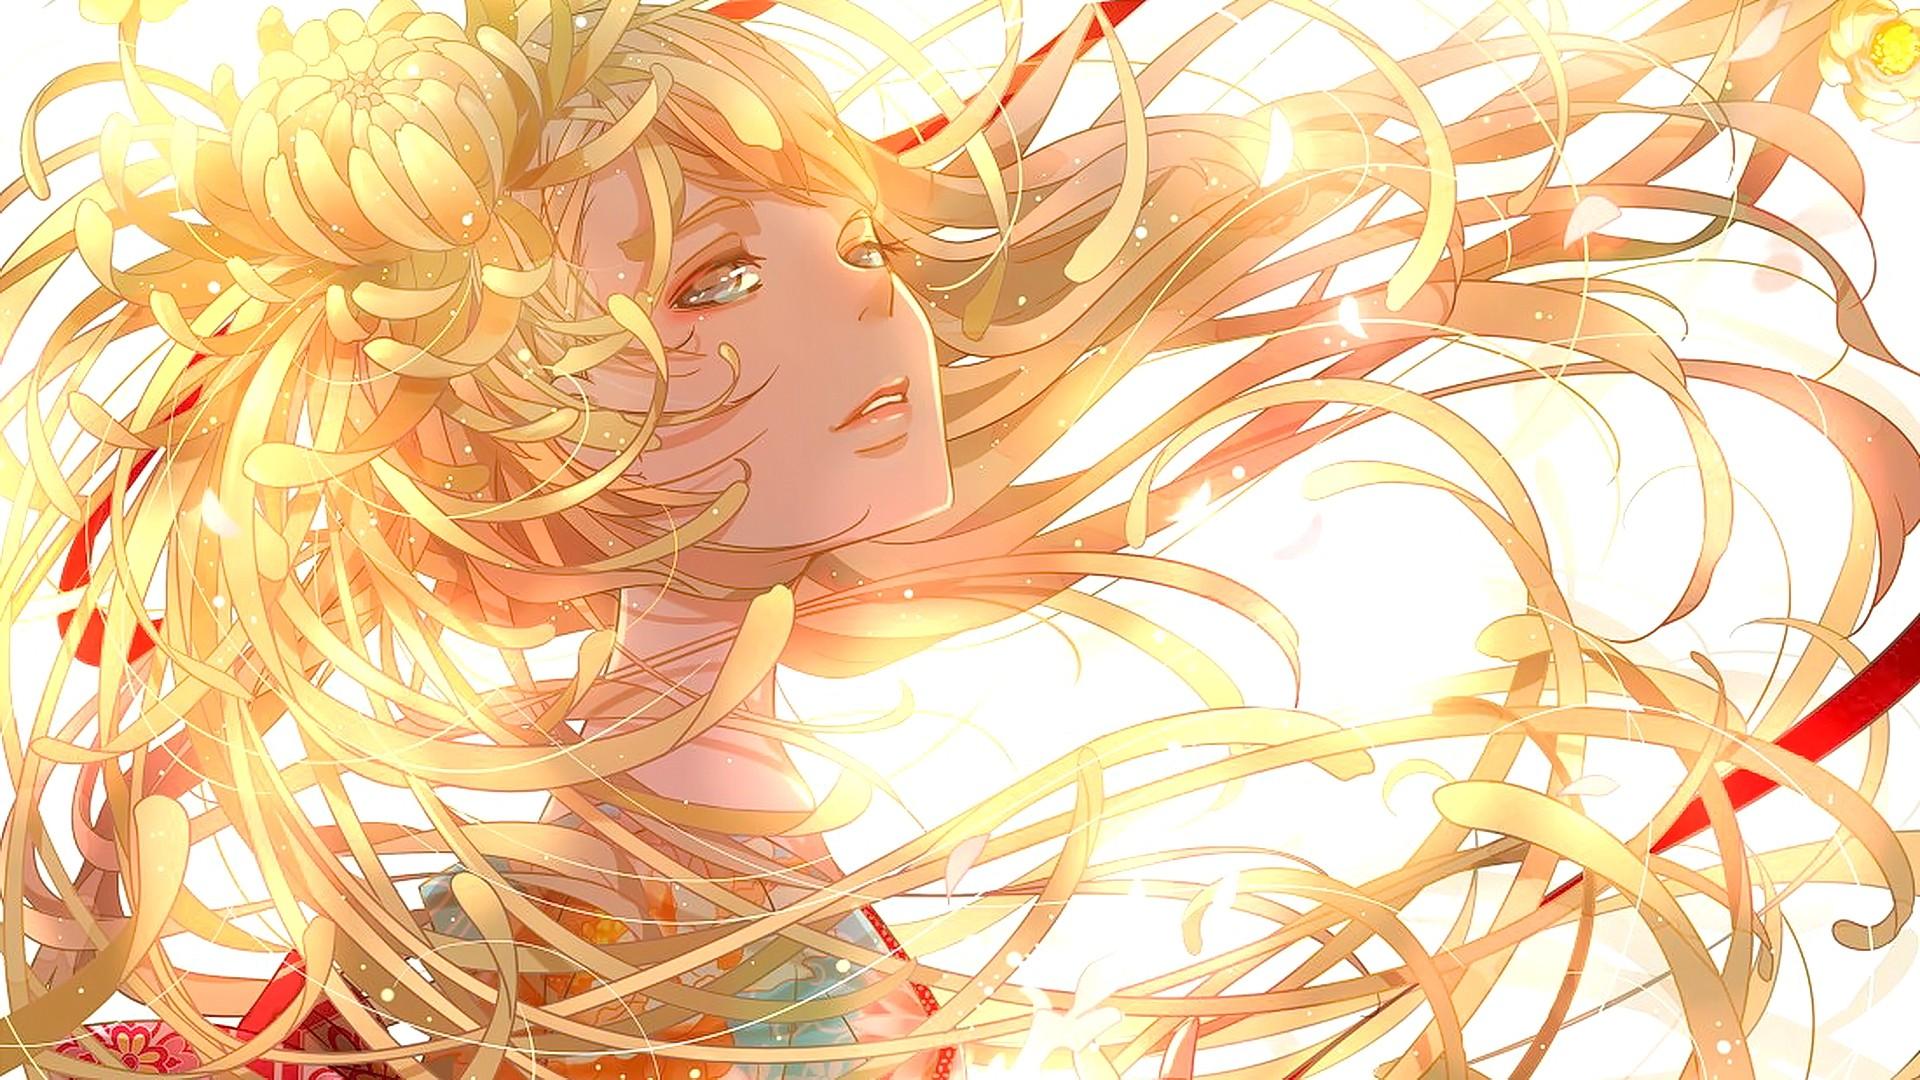 Wallpaper Illustration Blonde Anime Girls Original Characters Hair Mangaka 1920x1080 Consistenthypocrite 65752 Hd Wallpapers Wallhere